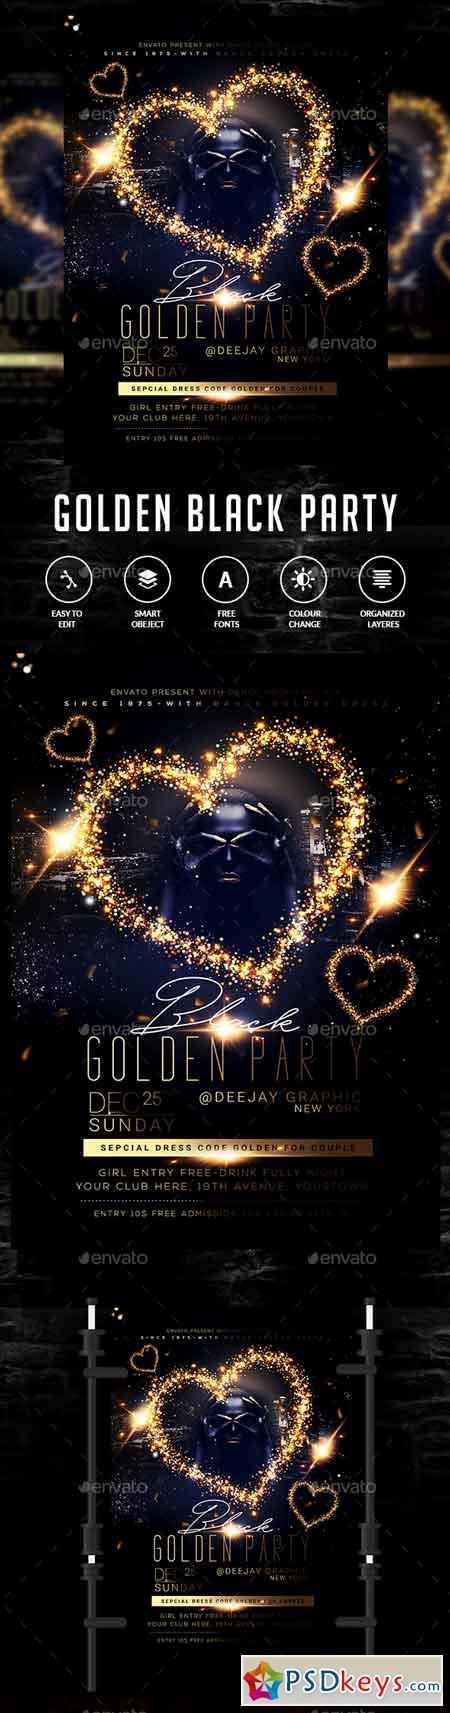 Golden Black Party Flyer 22876162